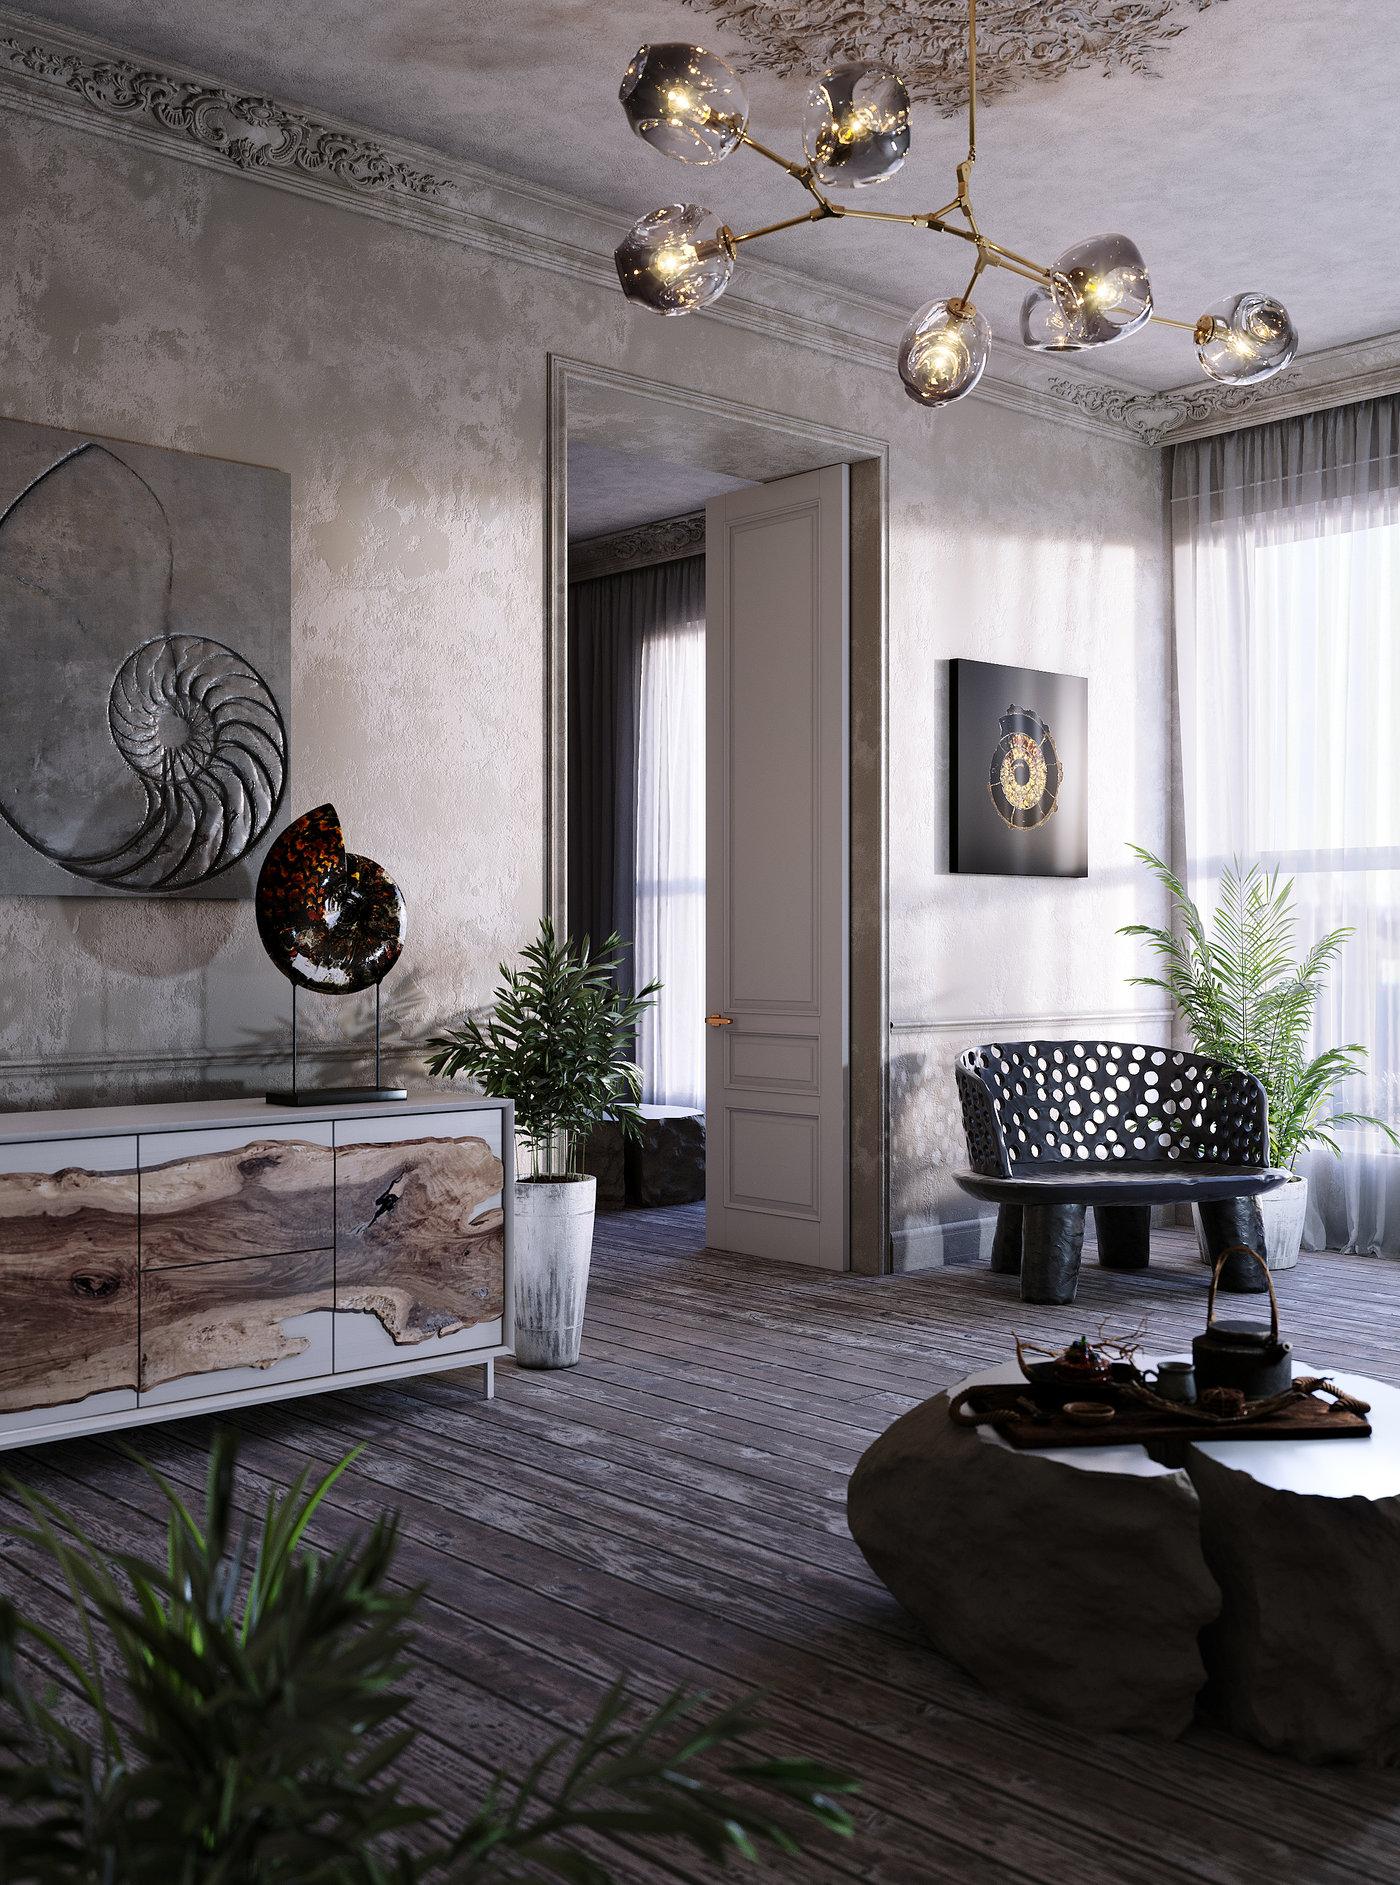 Collection of interior scenes Vol 1